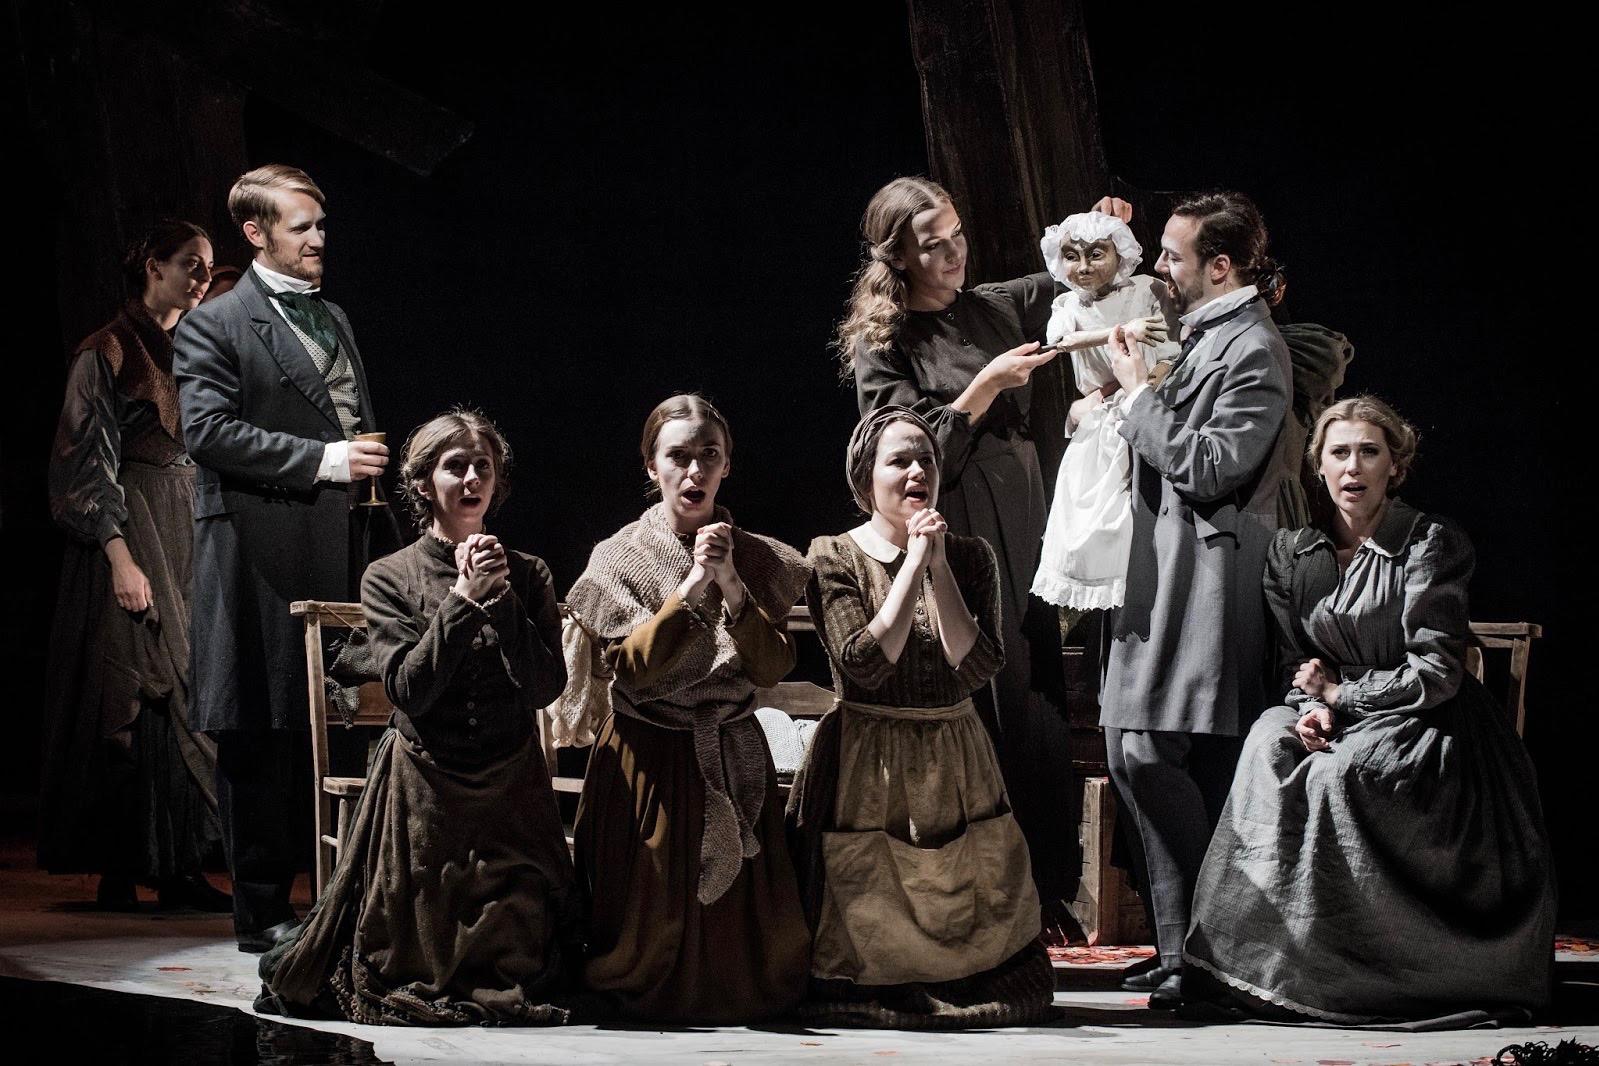 vanishing-bridegroom-group with puppet